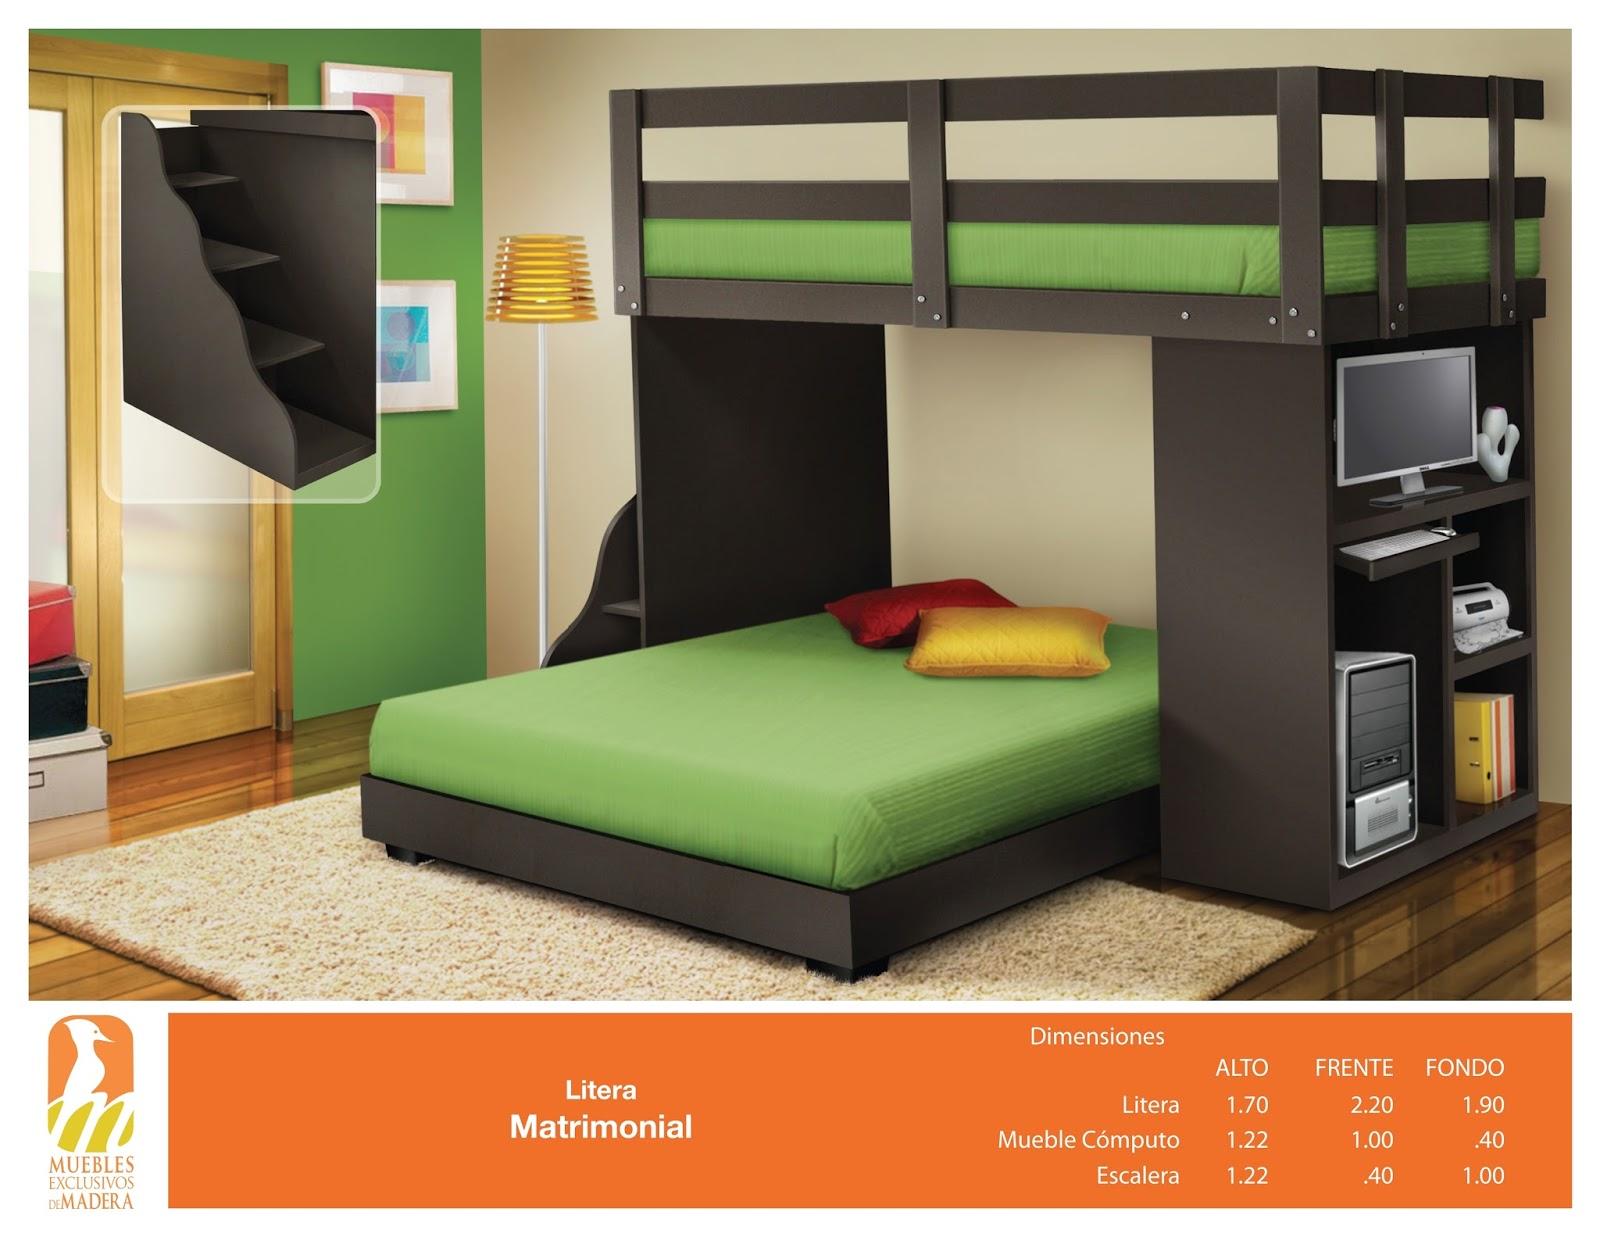 Muebleria zambrano muebles minimalista guadalajara camas - Camas literas modernas ...